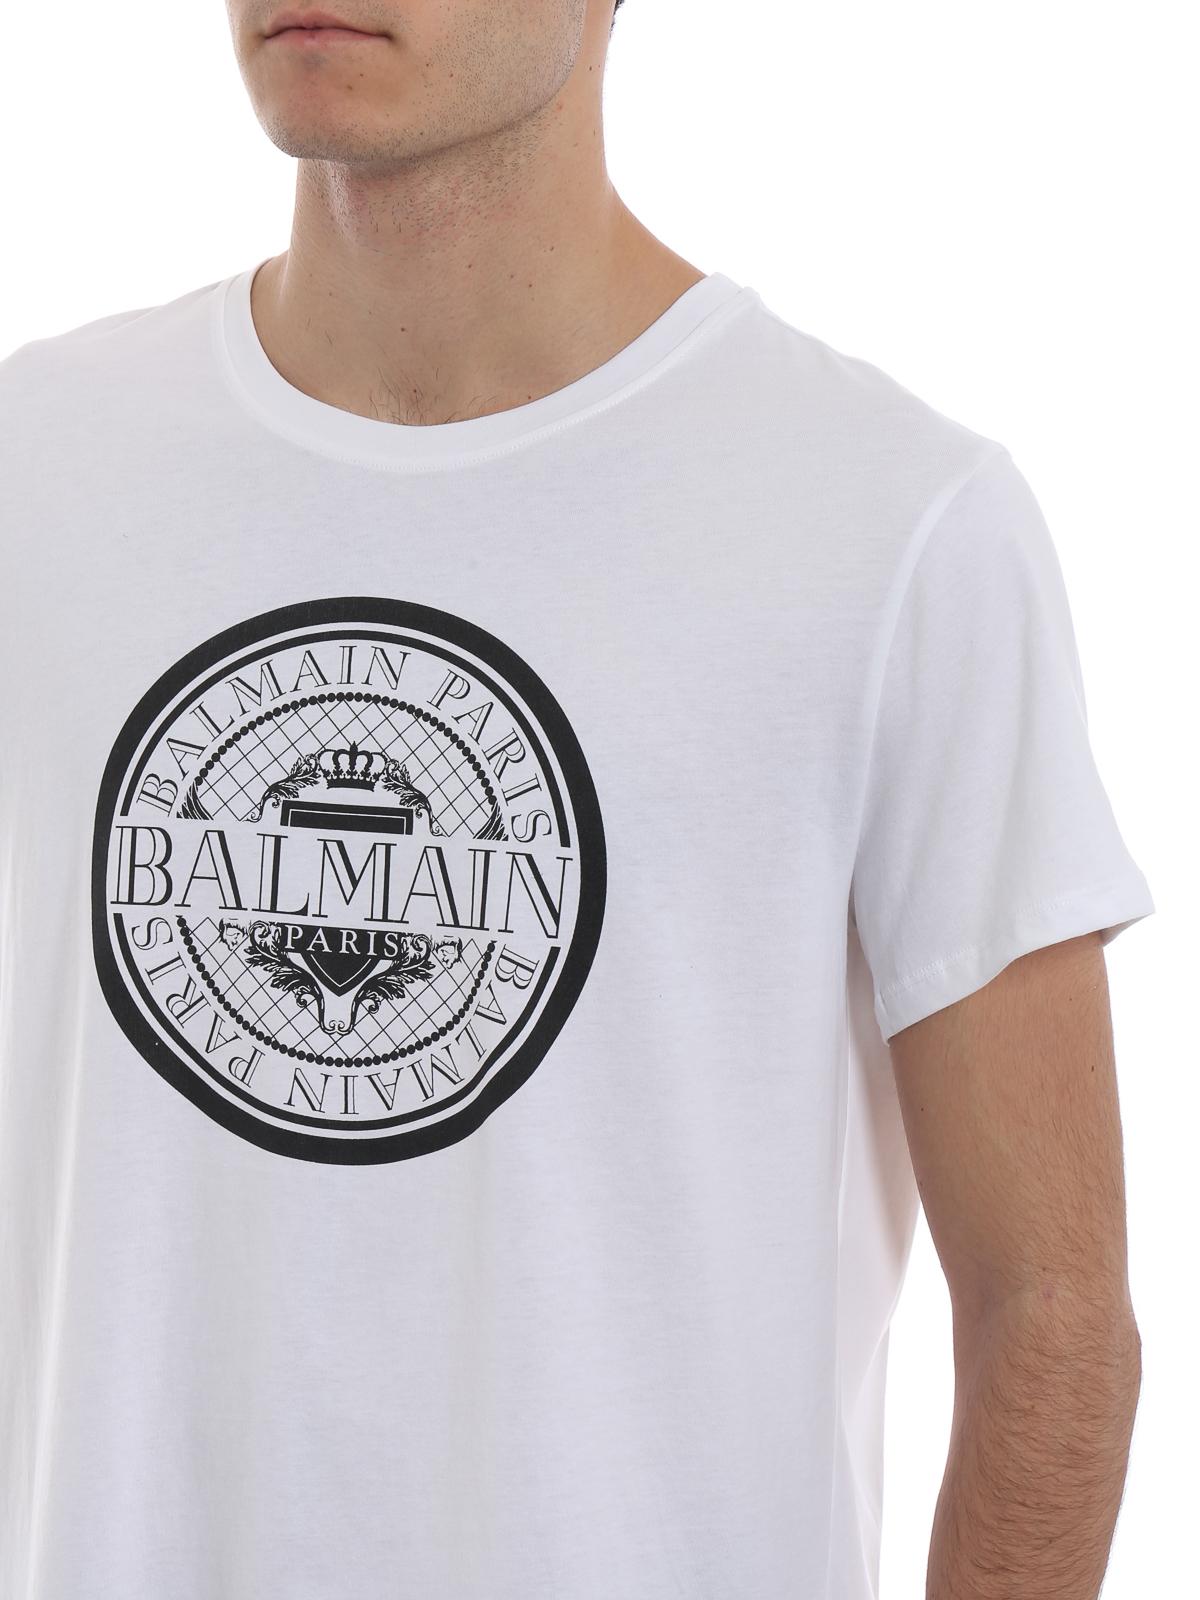 cddf9330 Balmain - Balmain Paris rubberized logo cotton T-shirt - t-shirts ...